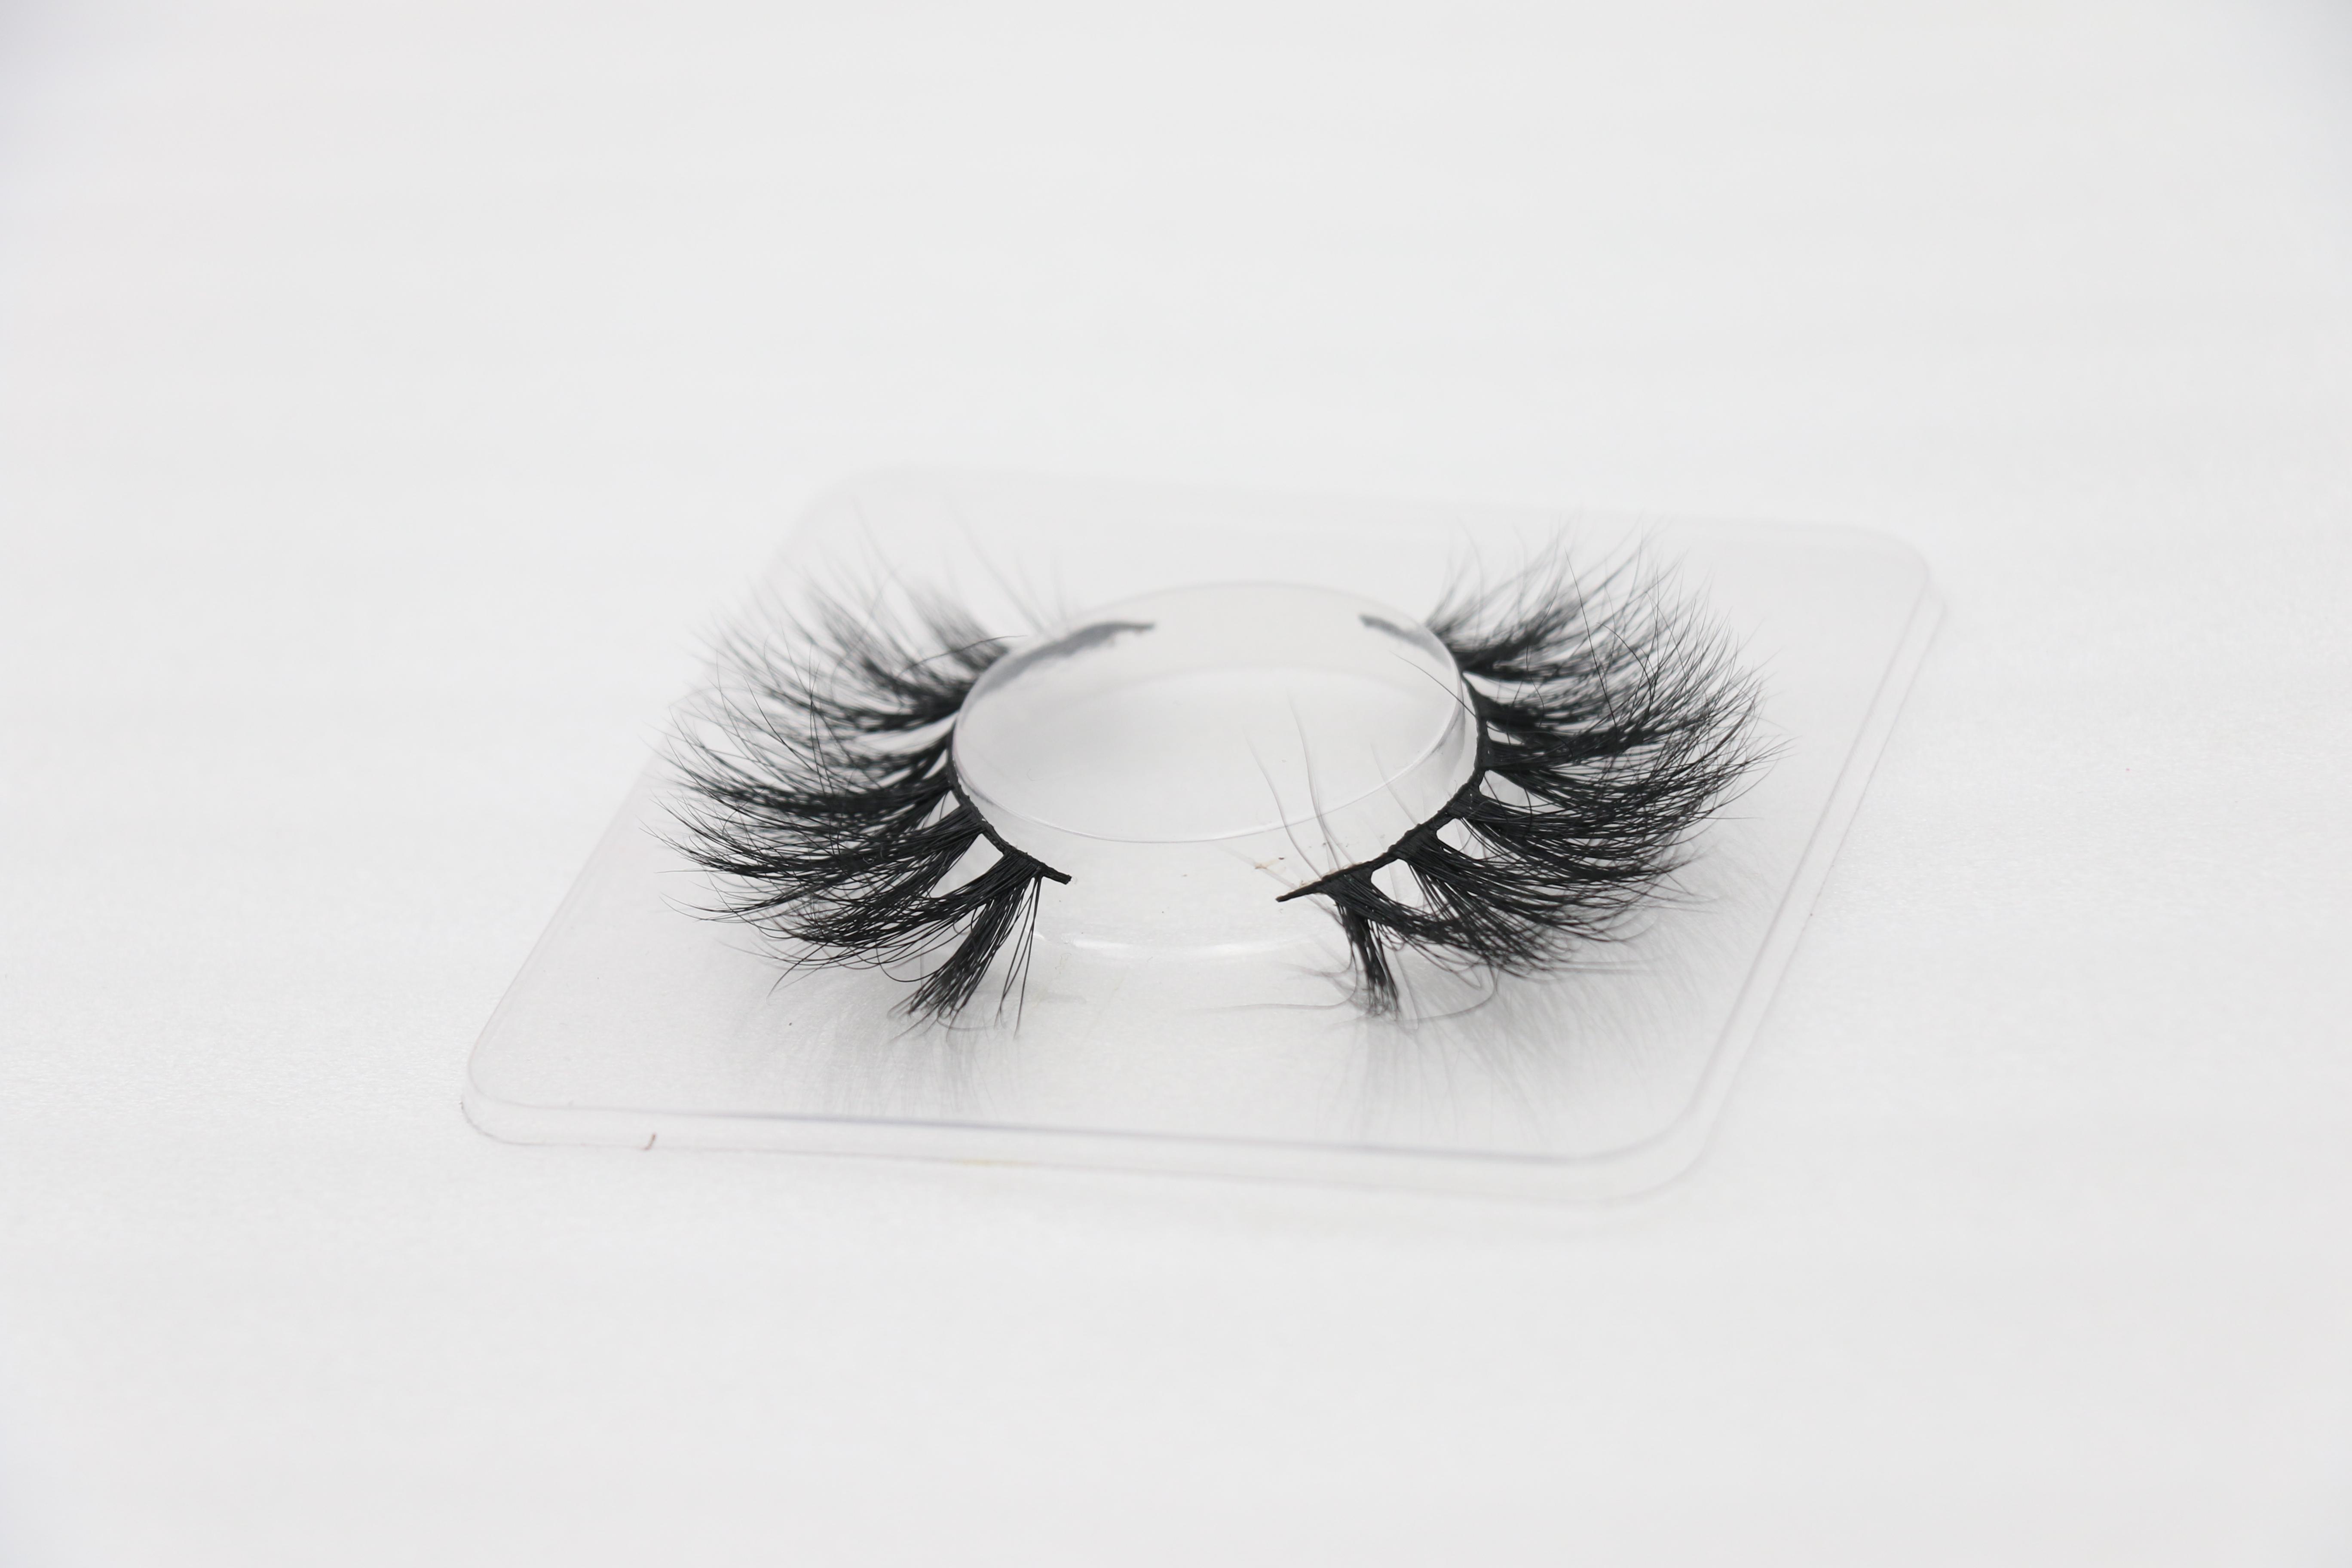 5f00efecb1d best wholesale eyelash vendors 25mm siberian mink lashes wholesale 3d mink  eyelash wholesale eyelash strip vendors